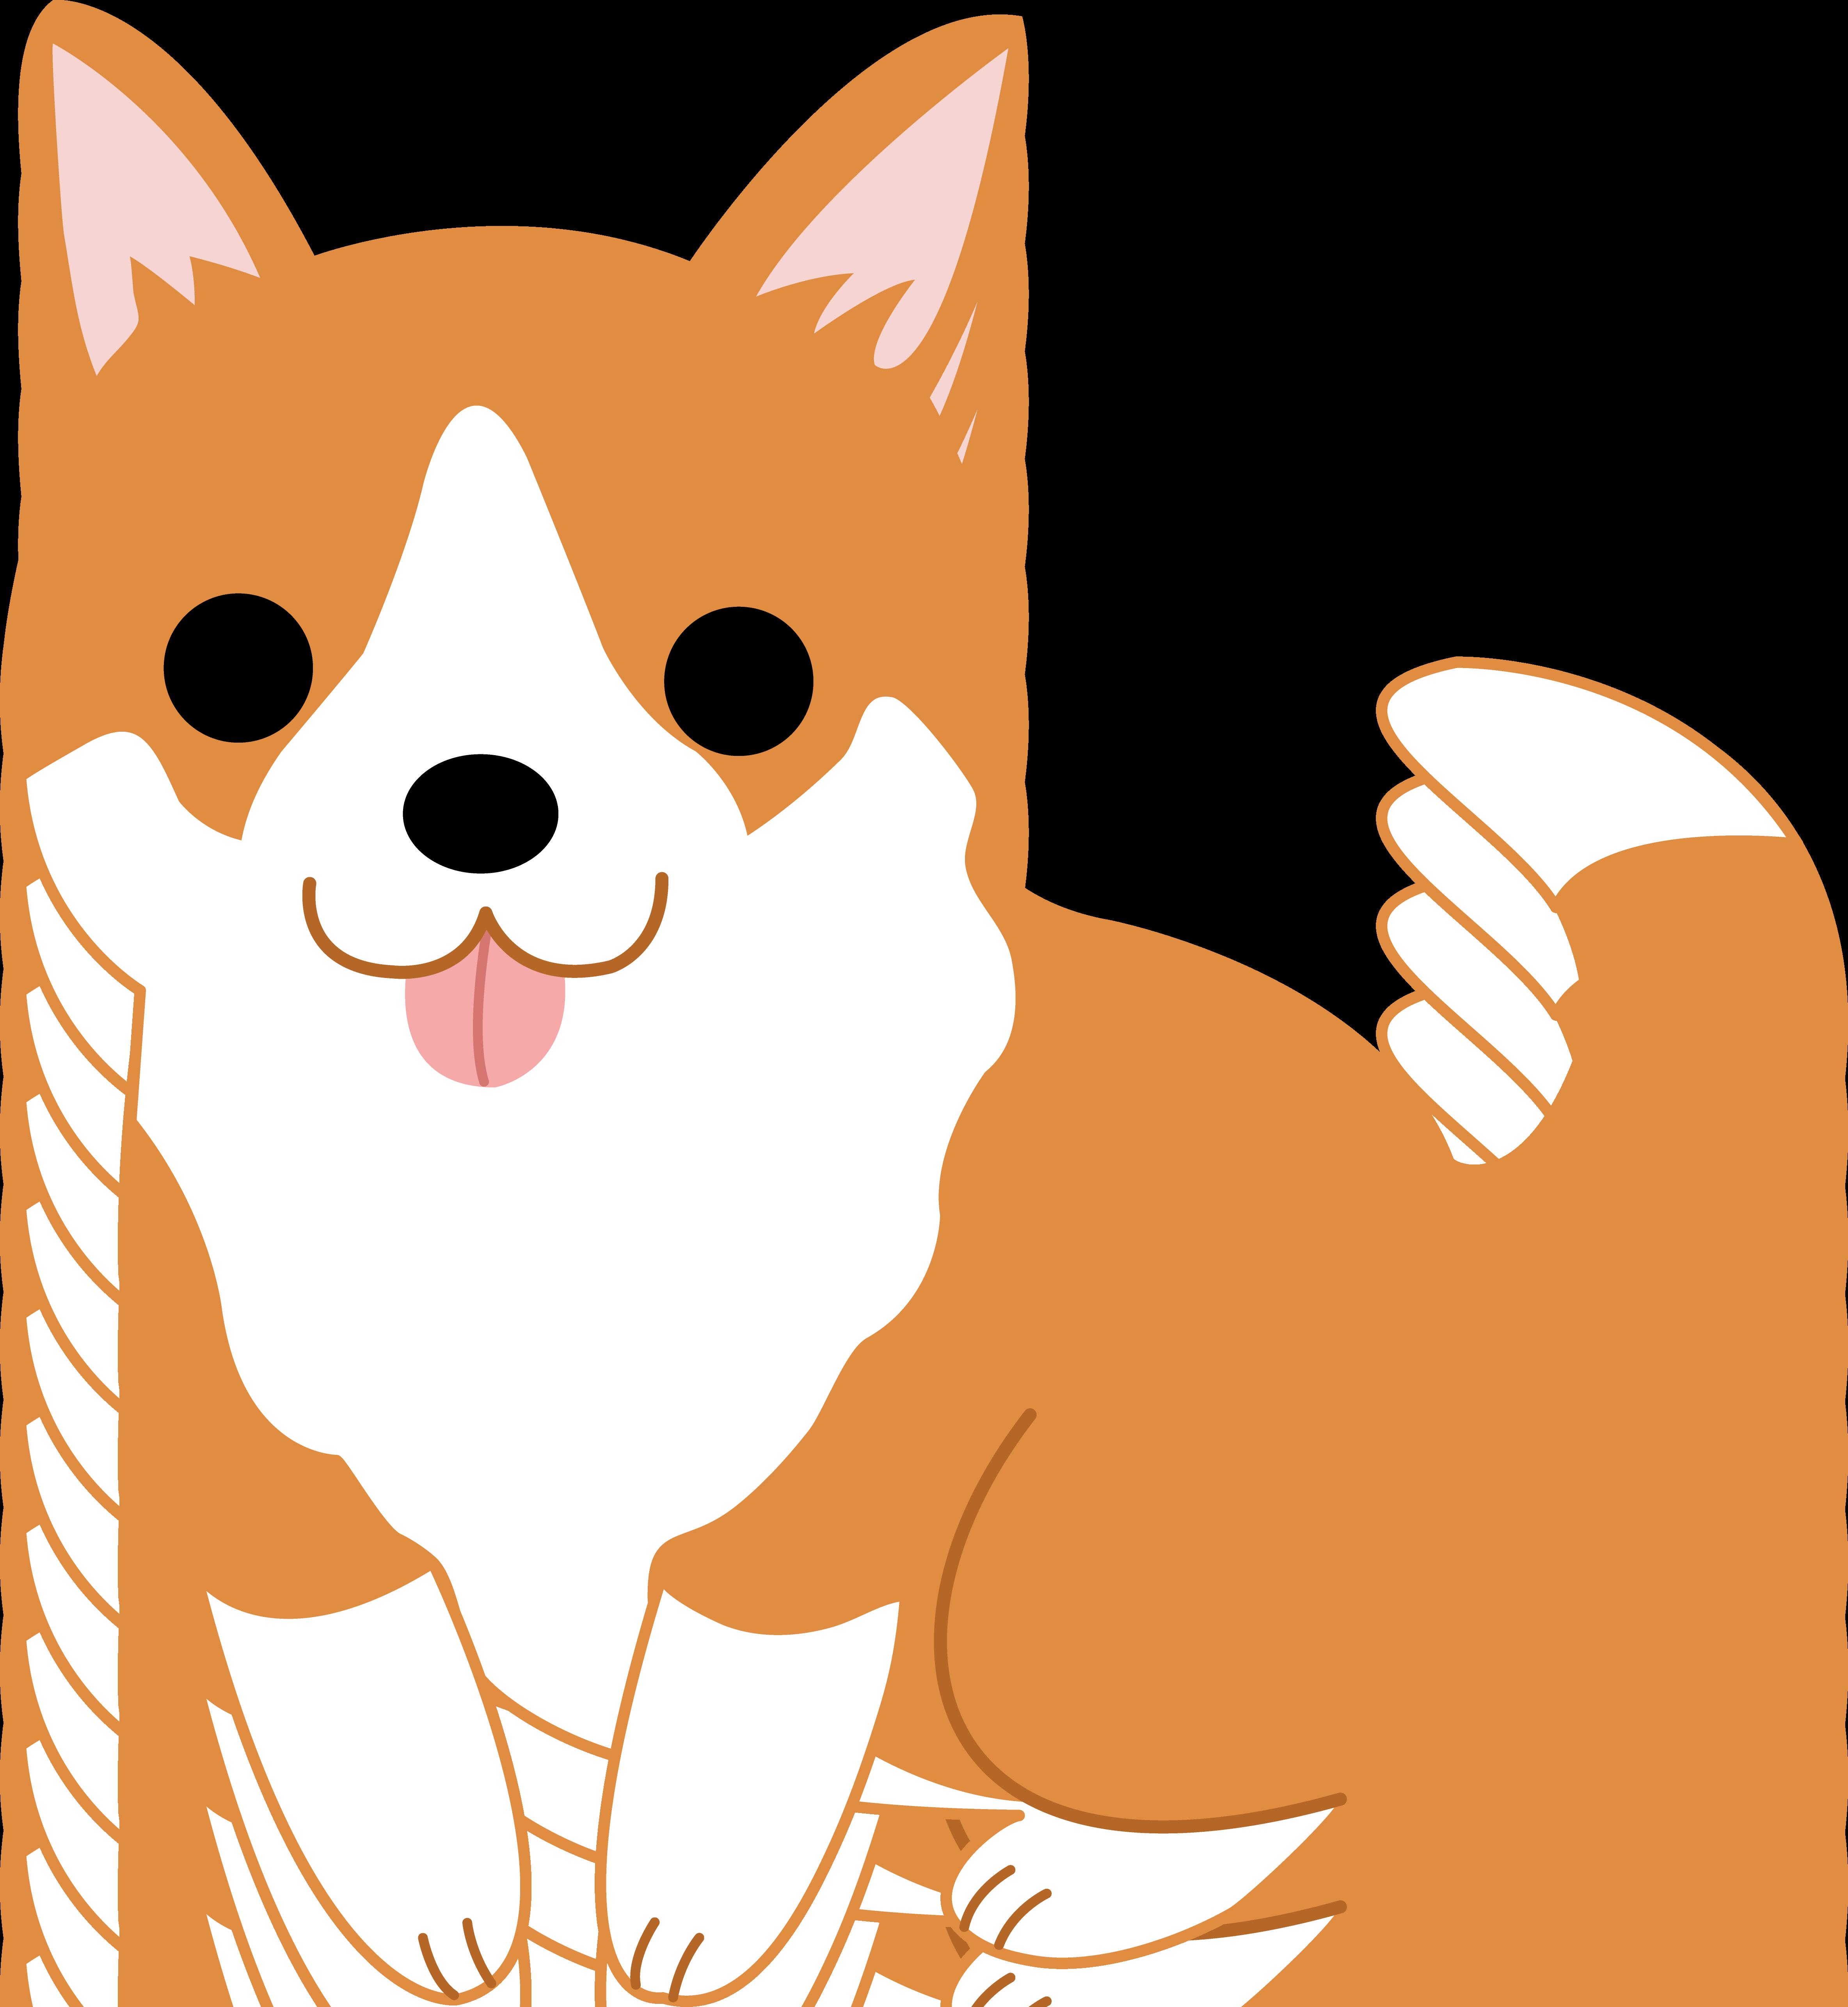 Kawaii clipart dog, Kawaii dog Transparent FREE for download